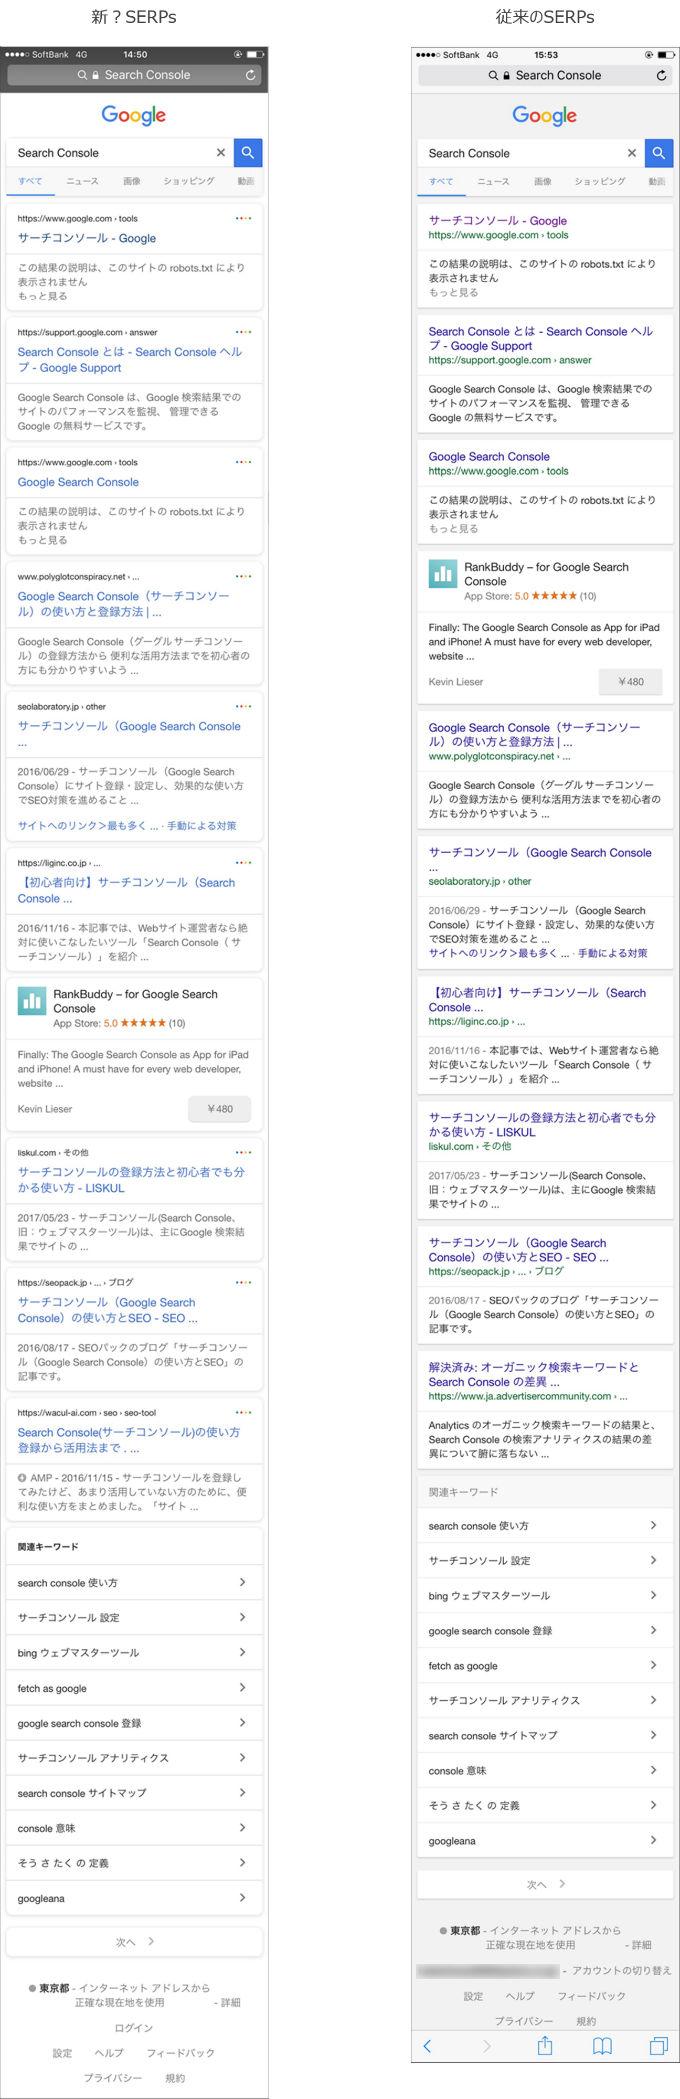 モバイル検索結果画面比較